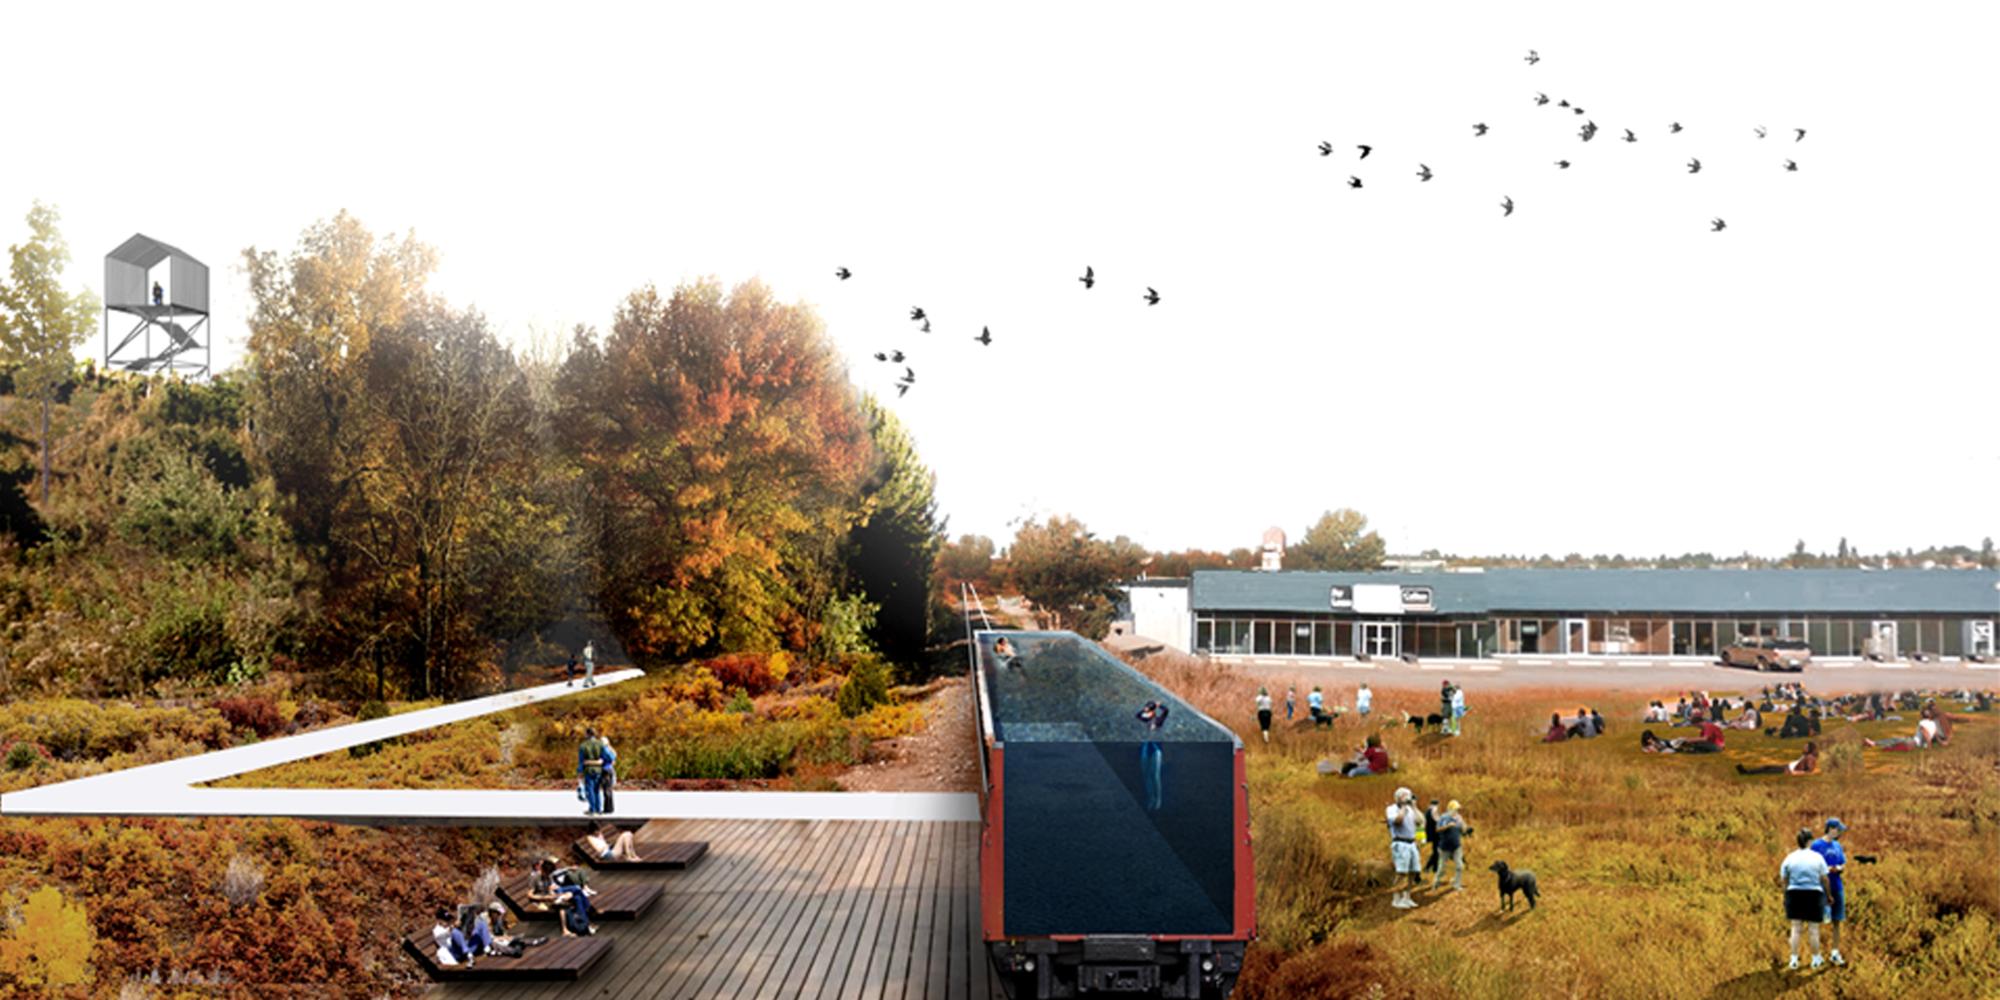 L a p laboratorio de arquitectura y paisaje primer lugar for Arquitectura del paisaje